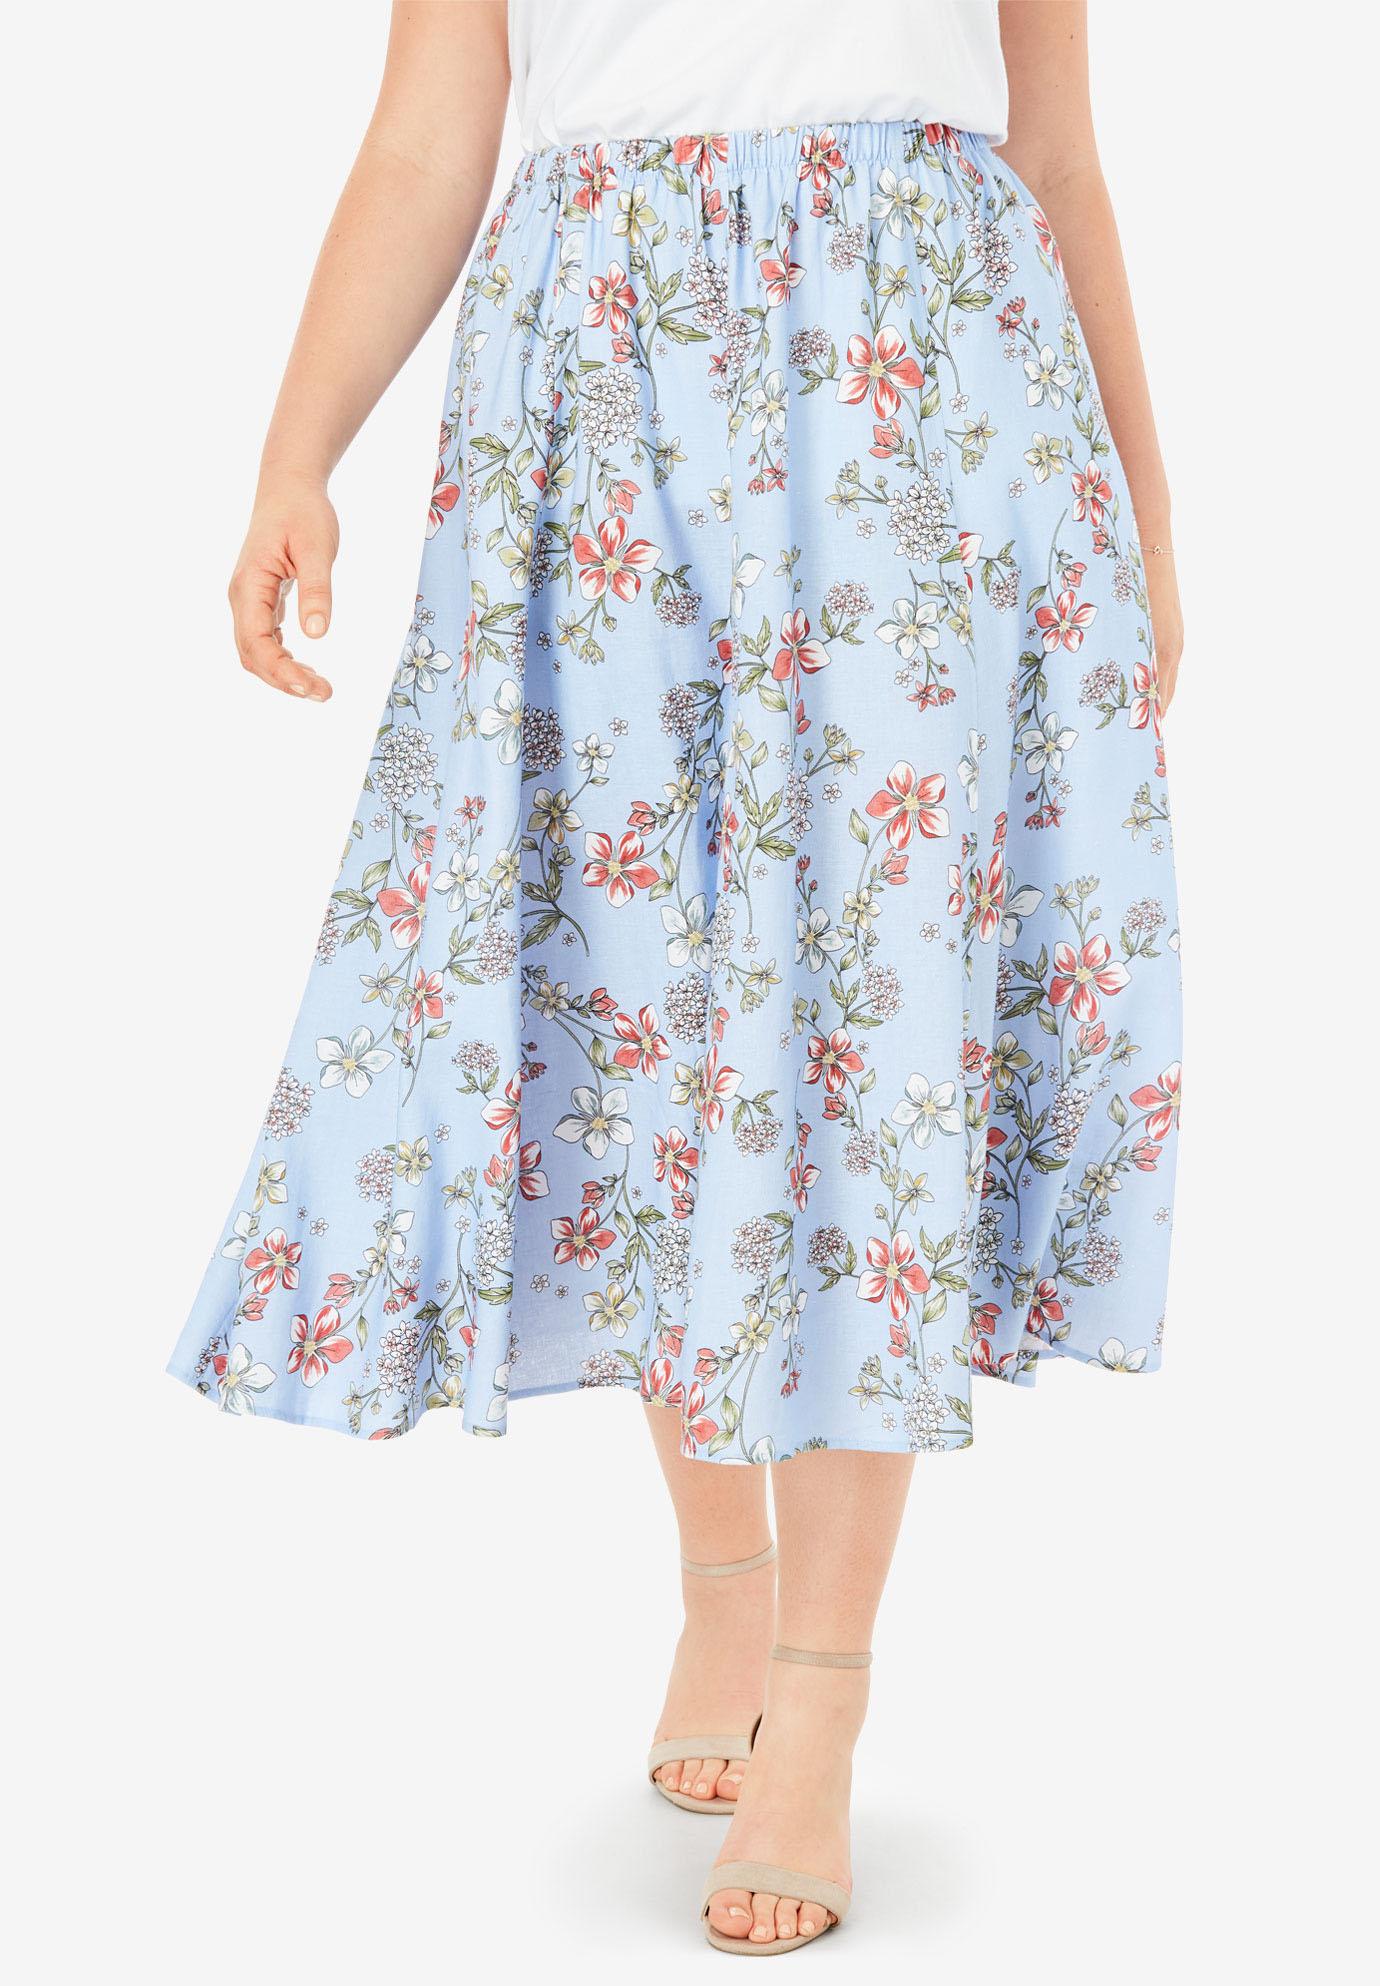 Linen-Blend Midi Skirt | Plus Size Skirts | Woman Within- photo #50